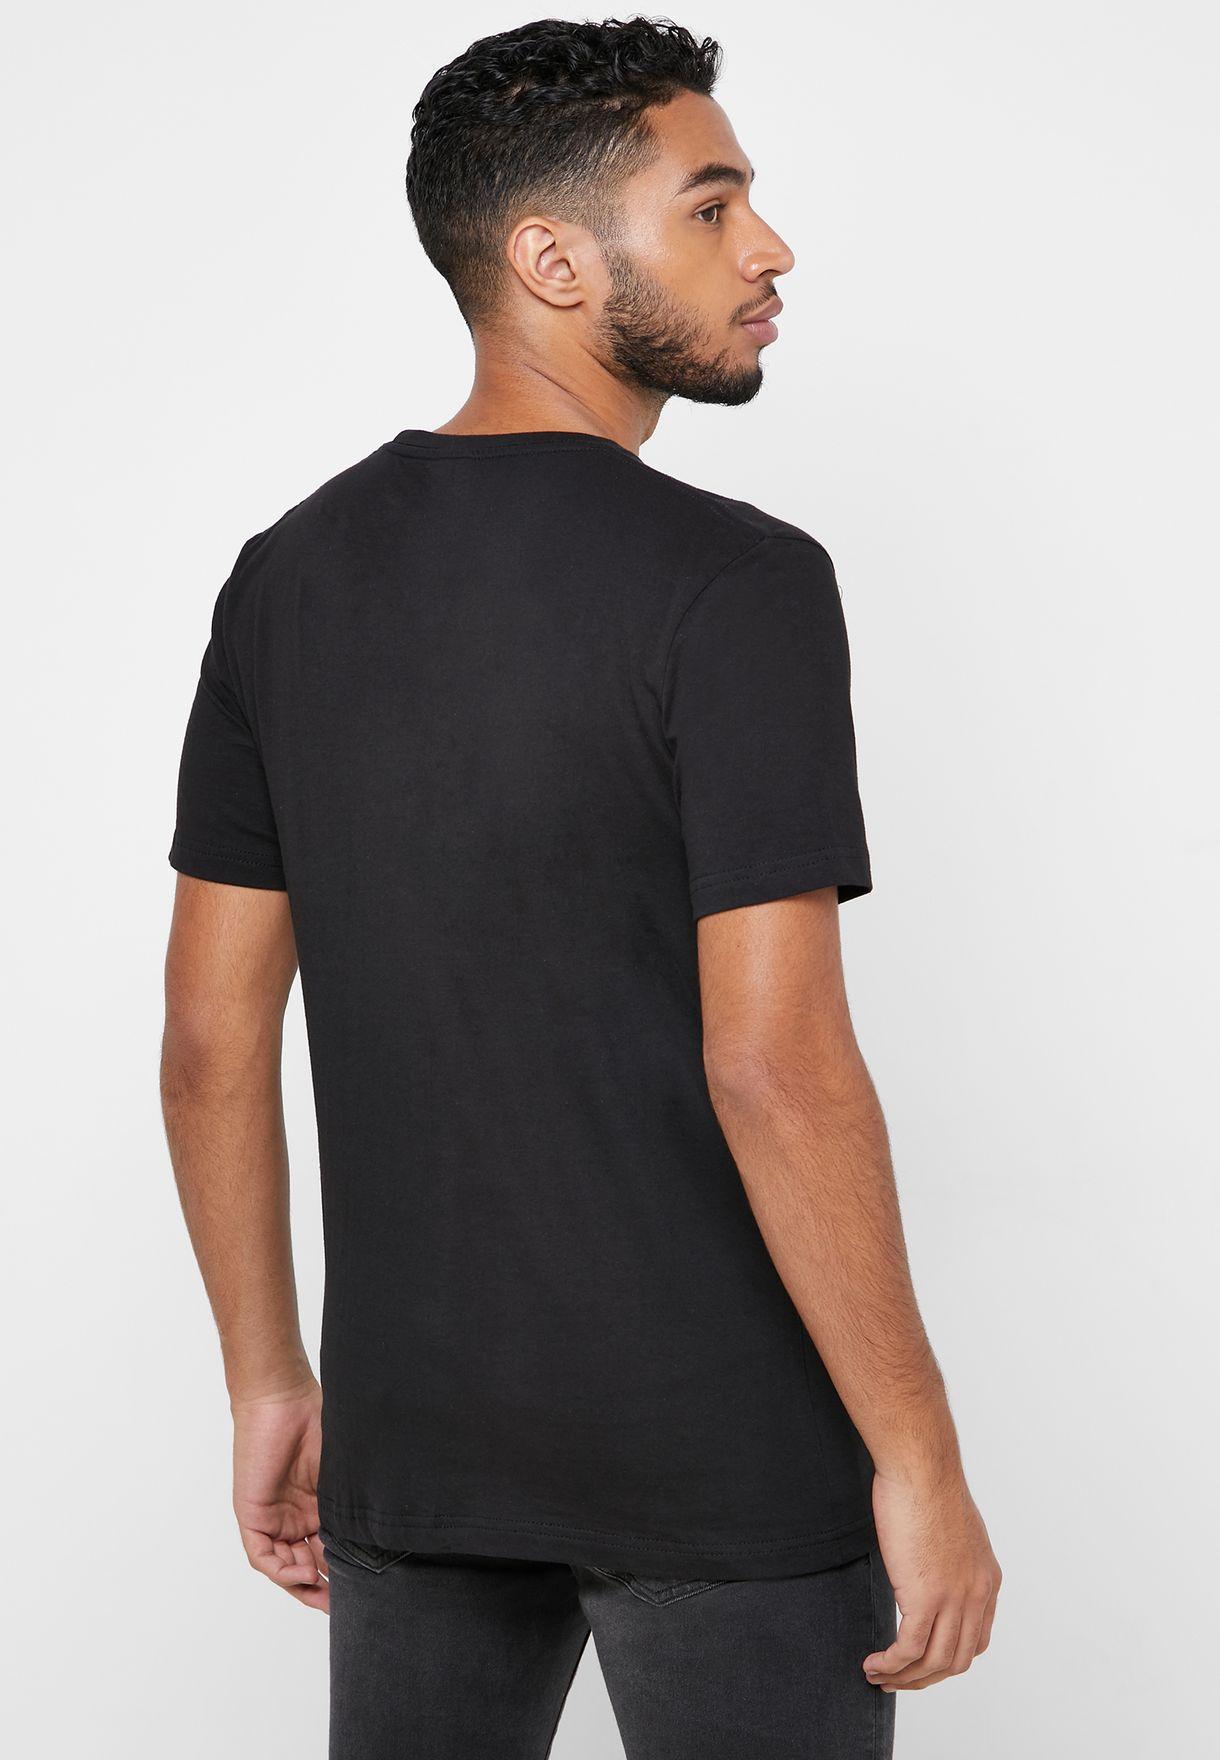 New York City Crew Neck T-Shirt